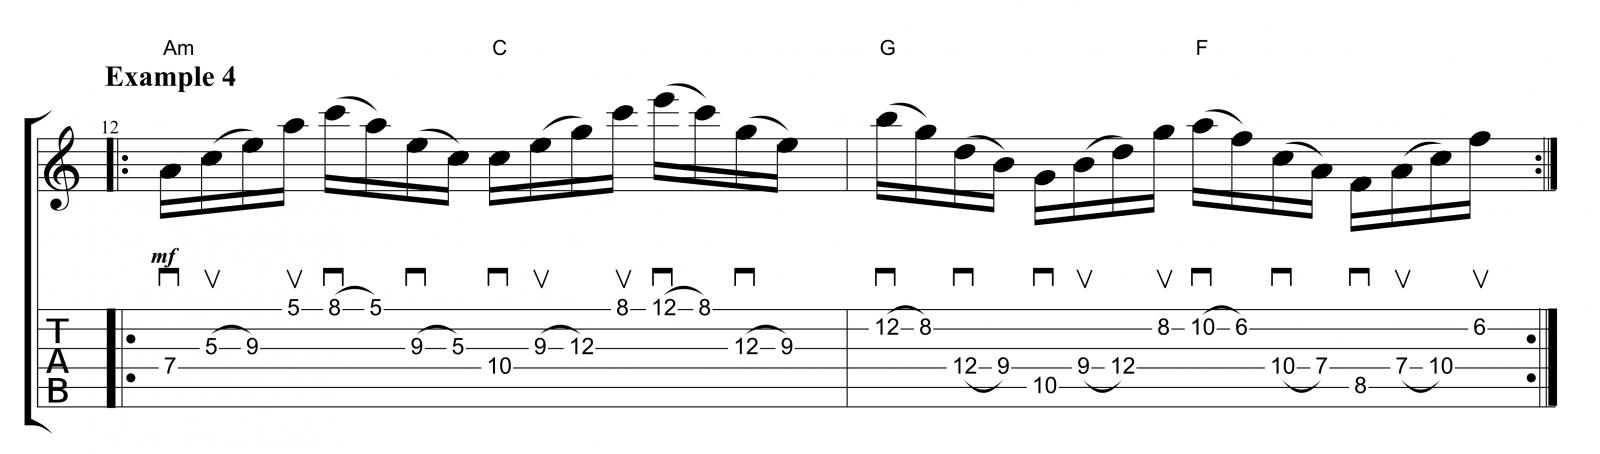 GW6 Example 4.jpg